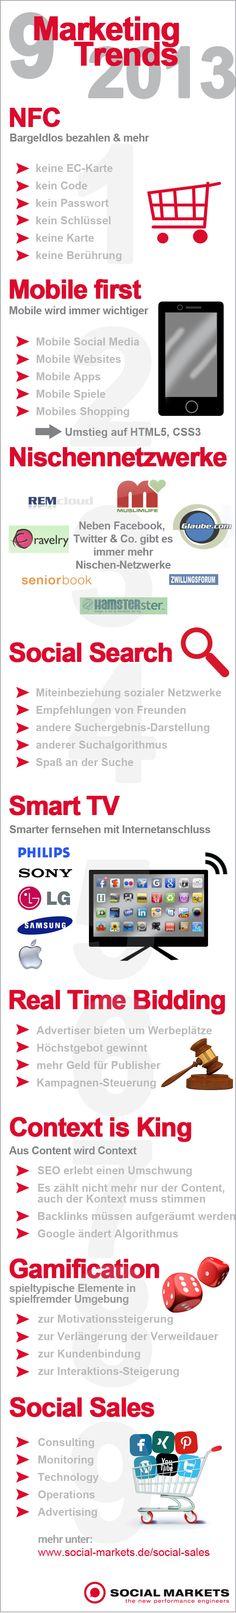 #Infografik #Trends2013 #Marketing #RTB #NFC #mobile #Gamification und vieles, vieles mehr